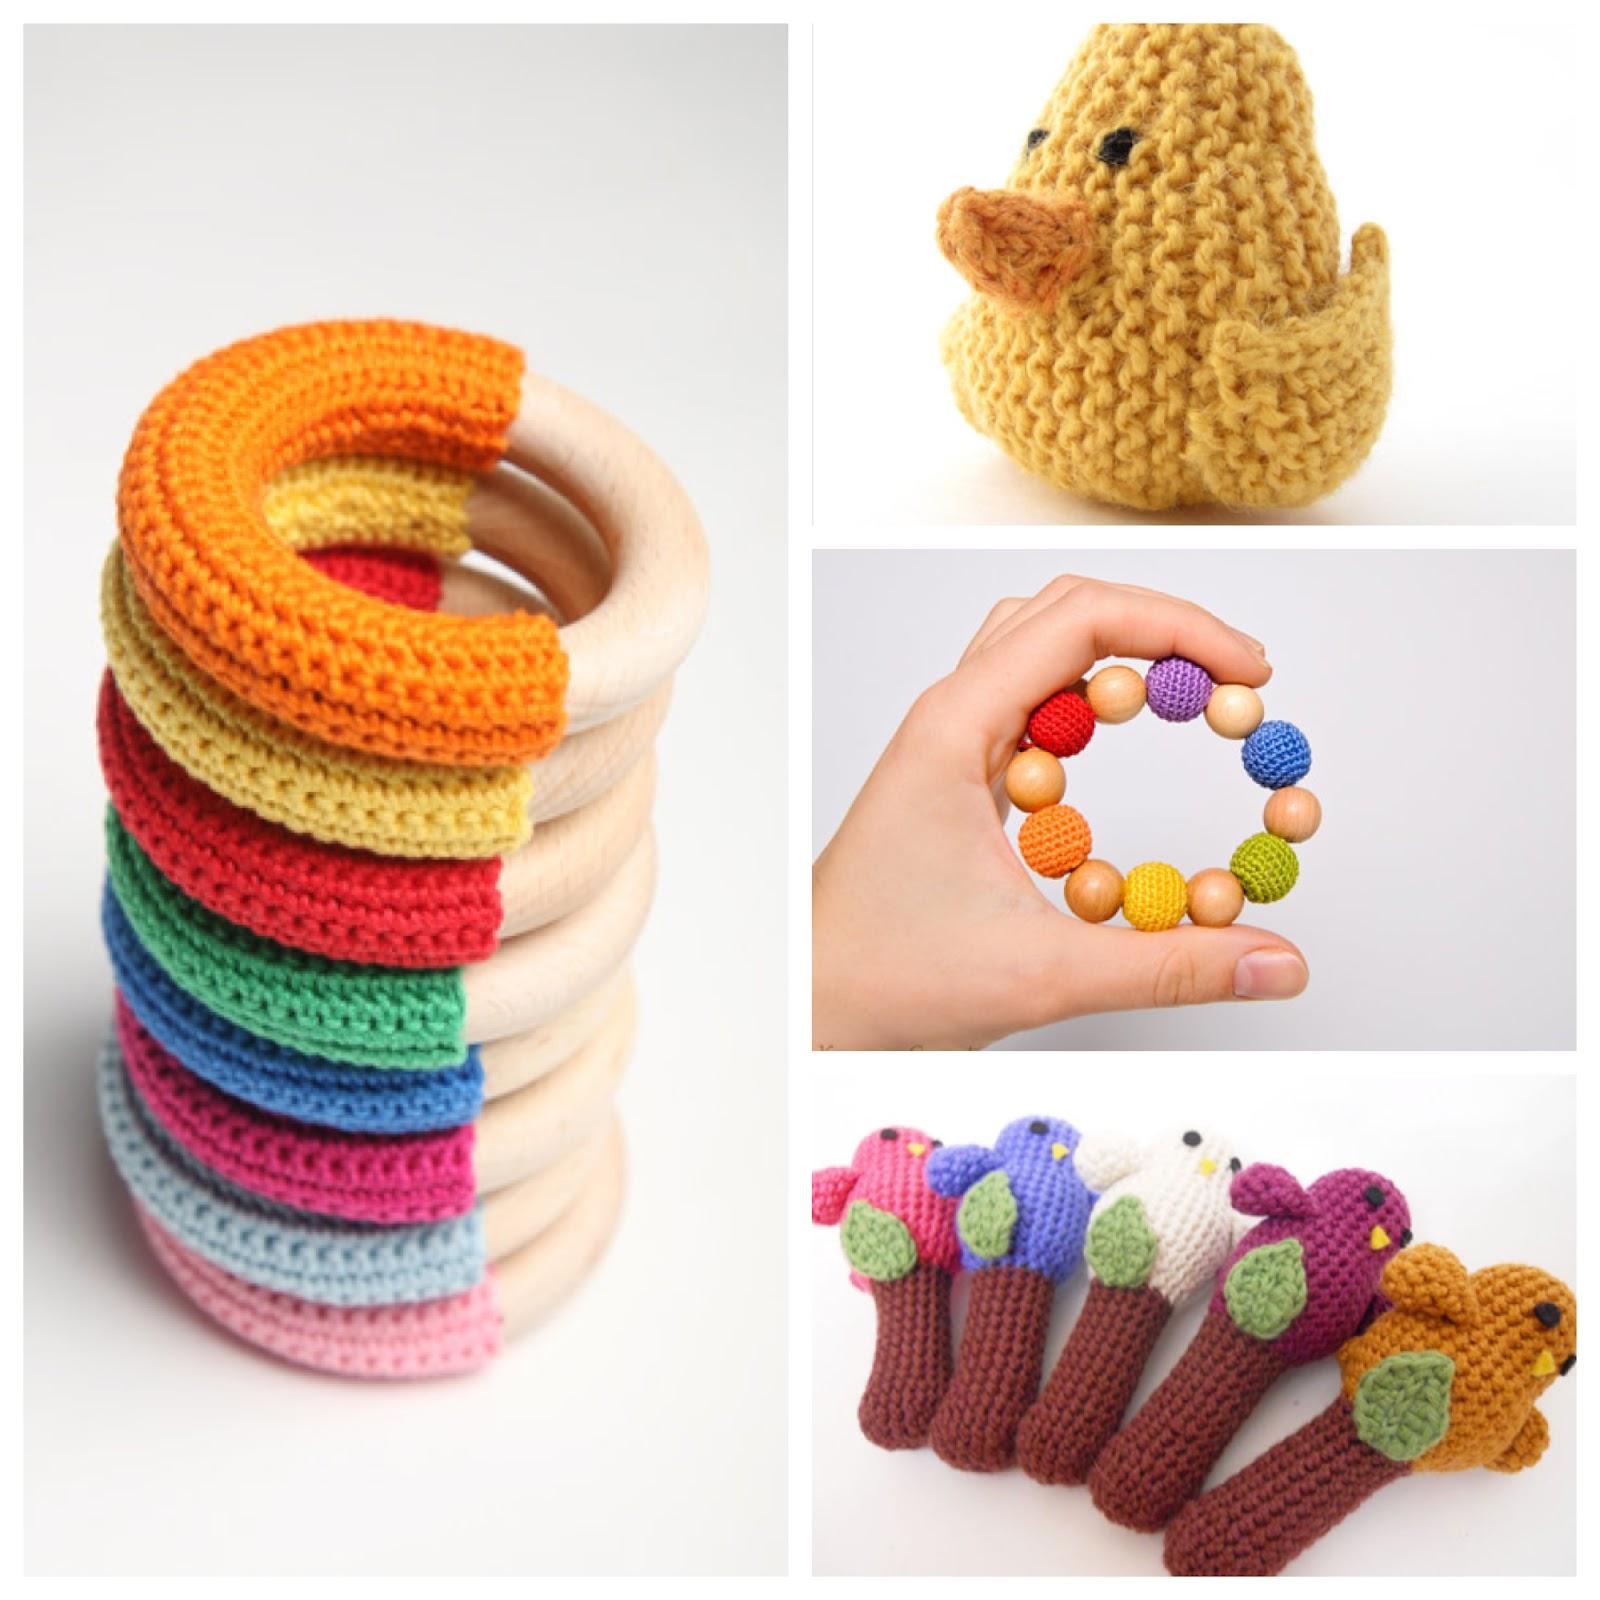 Knitting Toys For Babies : Mama kalalu june